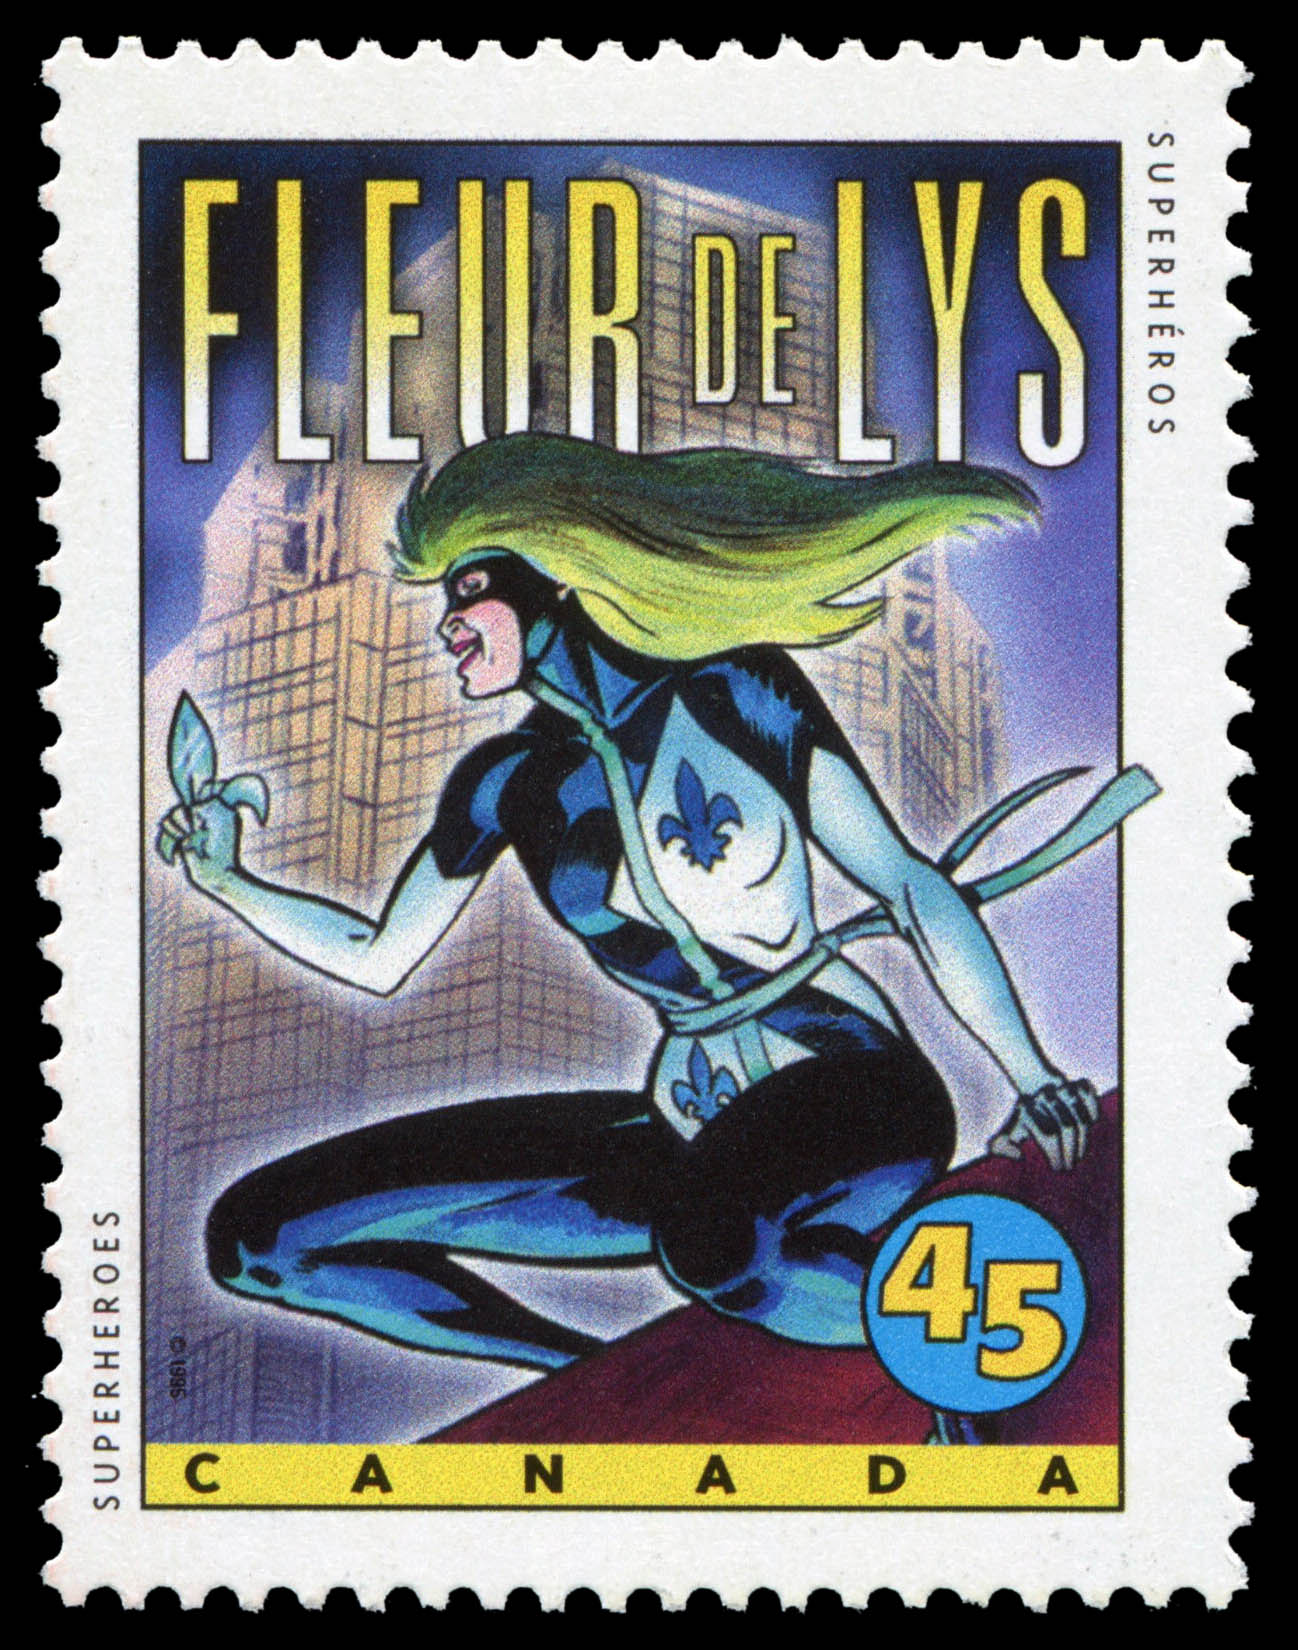 Fleur de Lys Canada Postage Stamp | Comic Book Superheroes